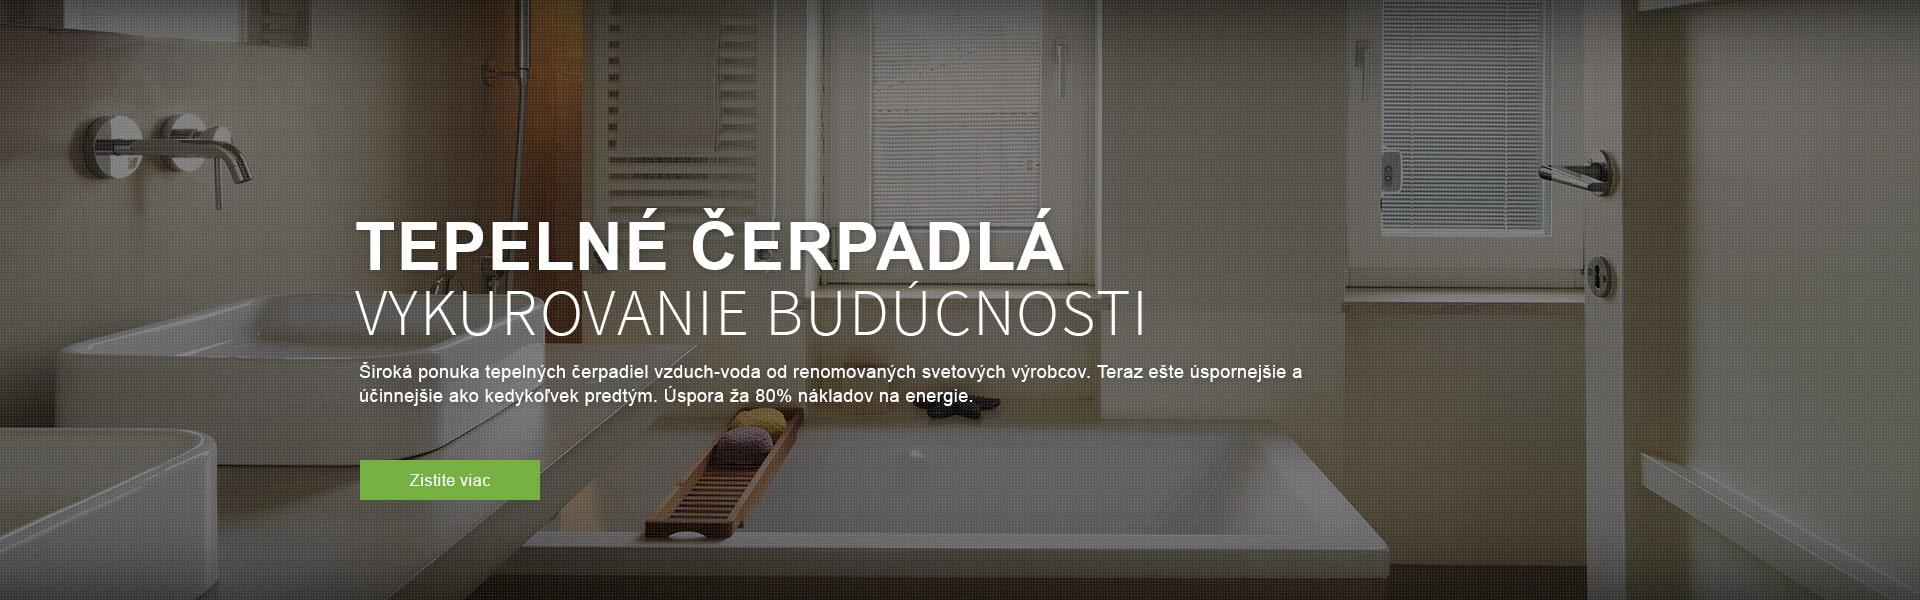 nivo_slider_uvod_tepelne_cerpadla_pata-min.jpg